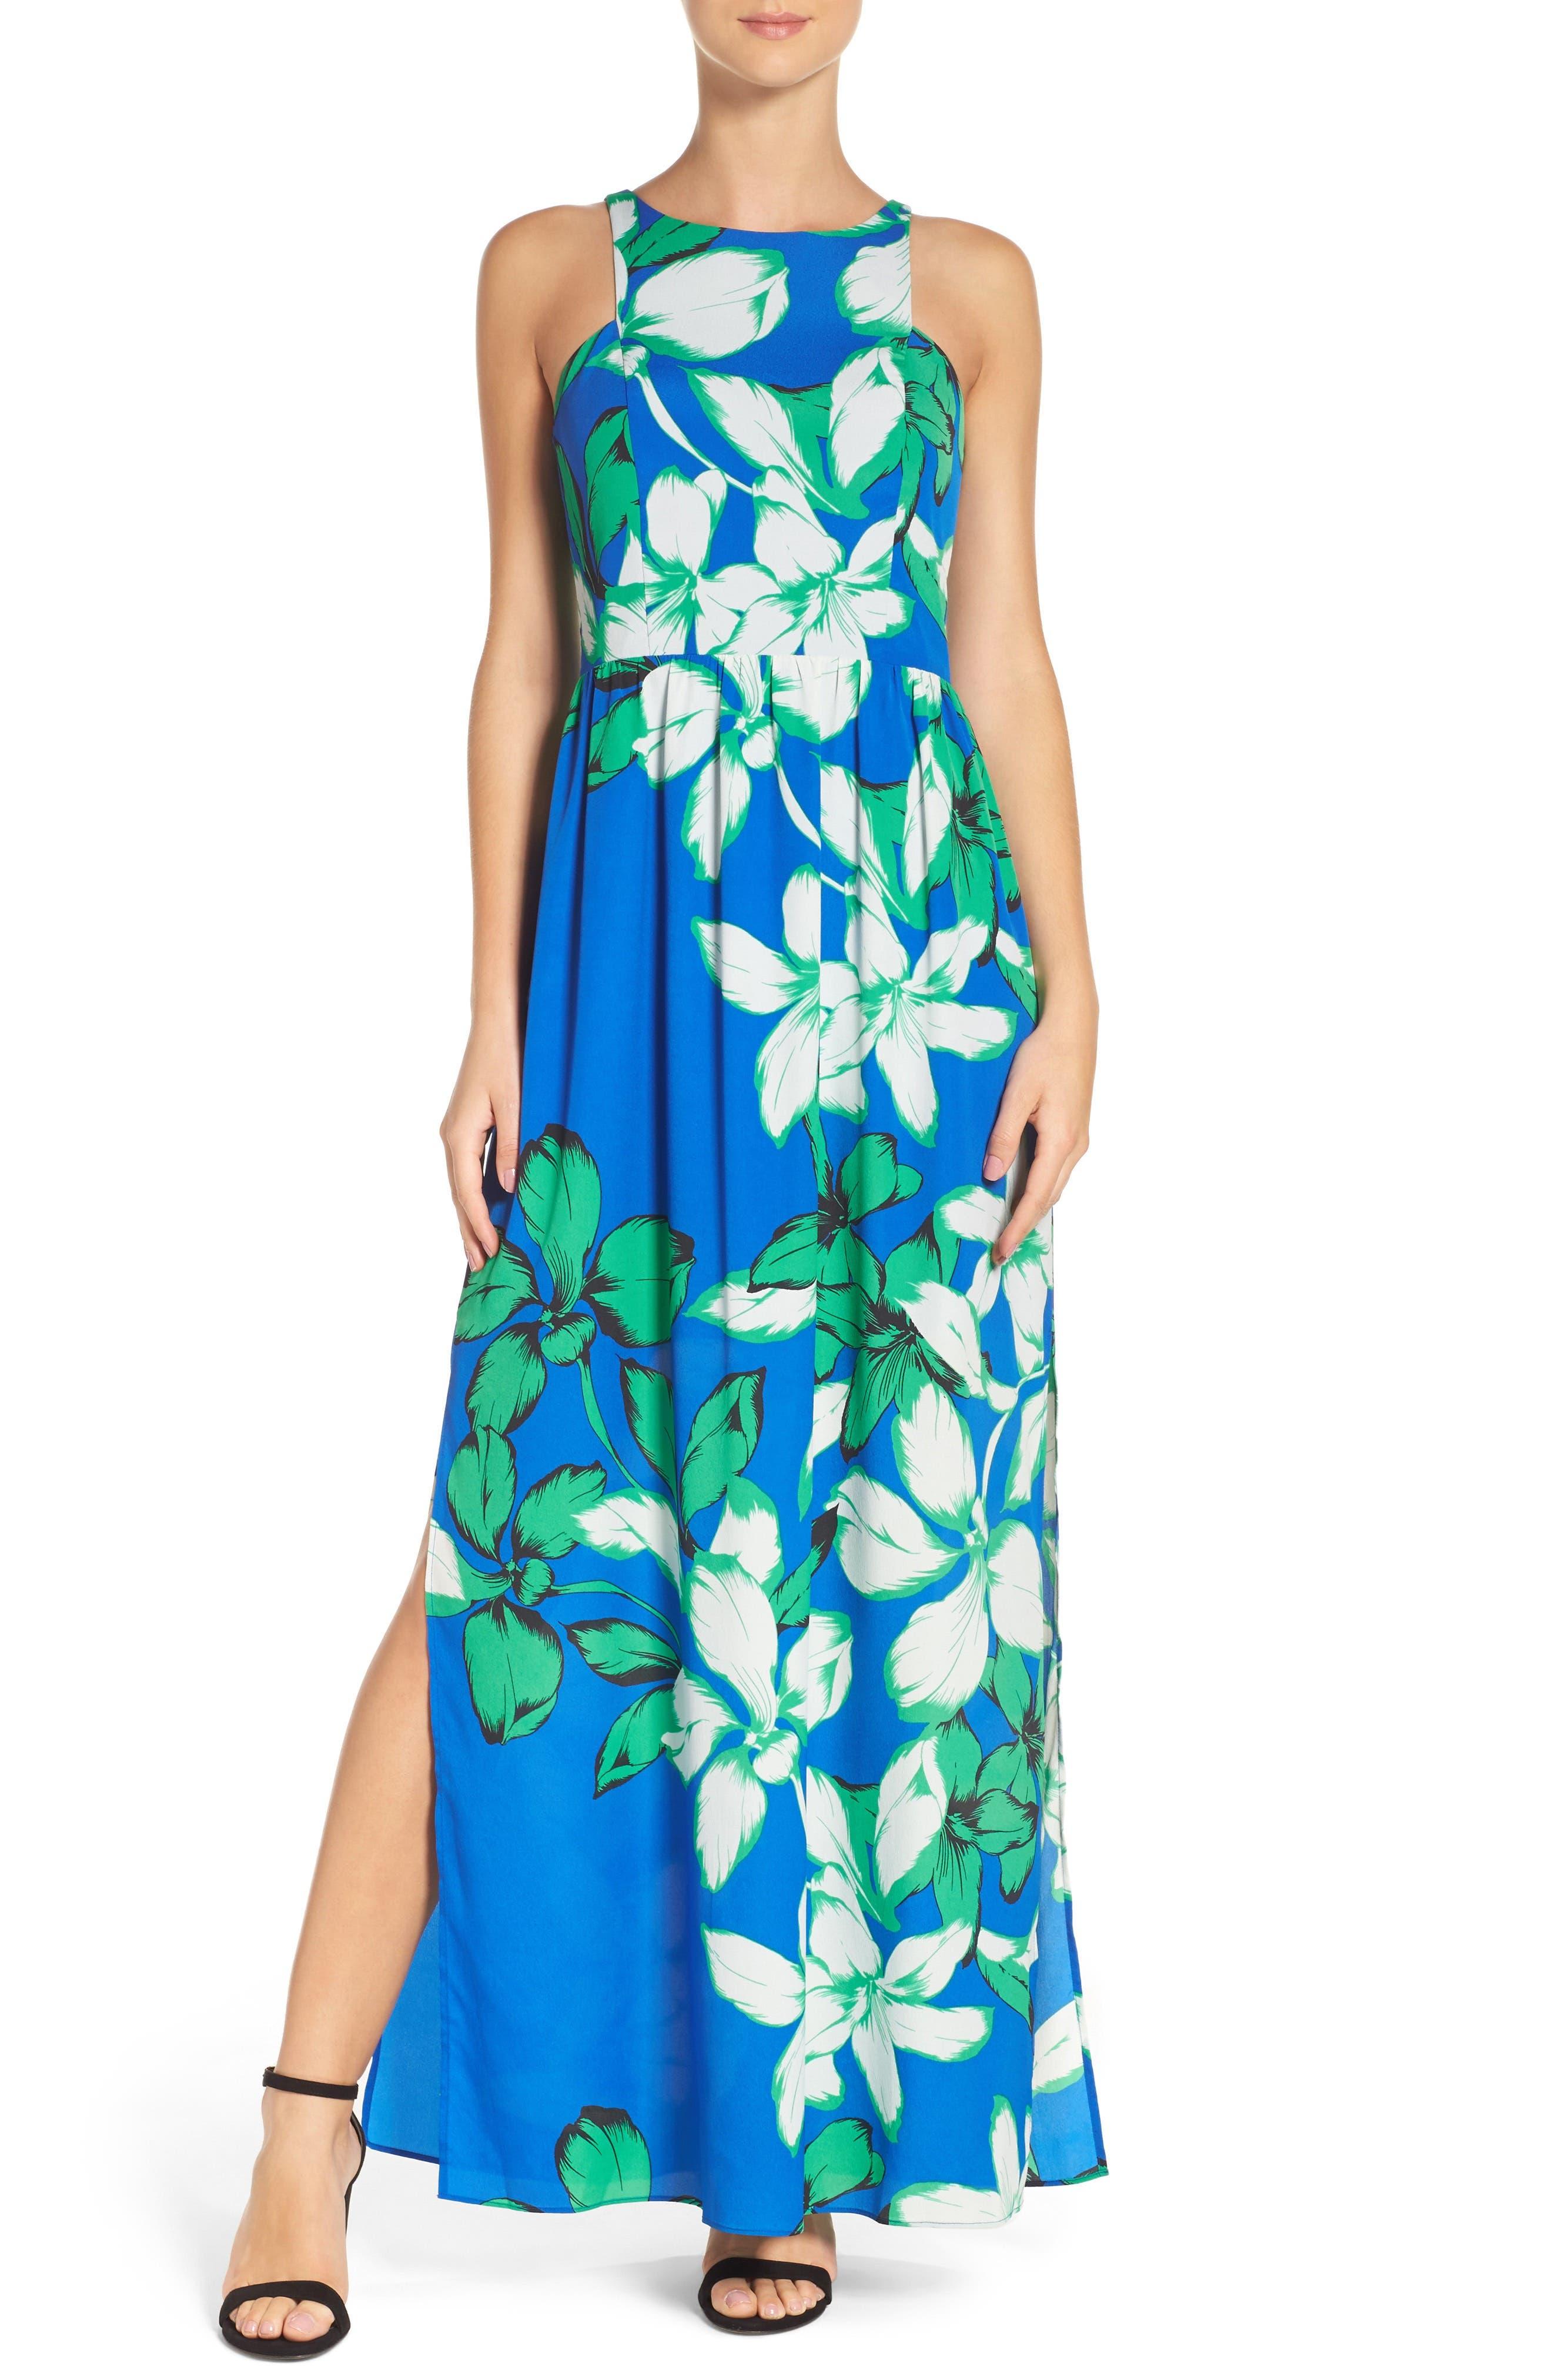 Alternate Image 1 Selected - Chelsea28 Cutaway Shoulder Maxi Dress